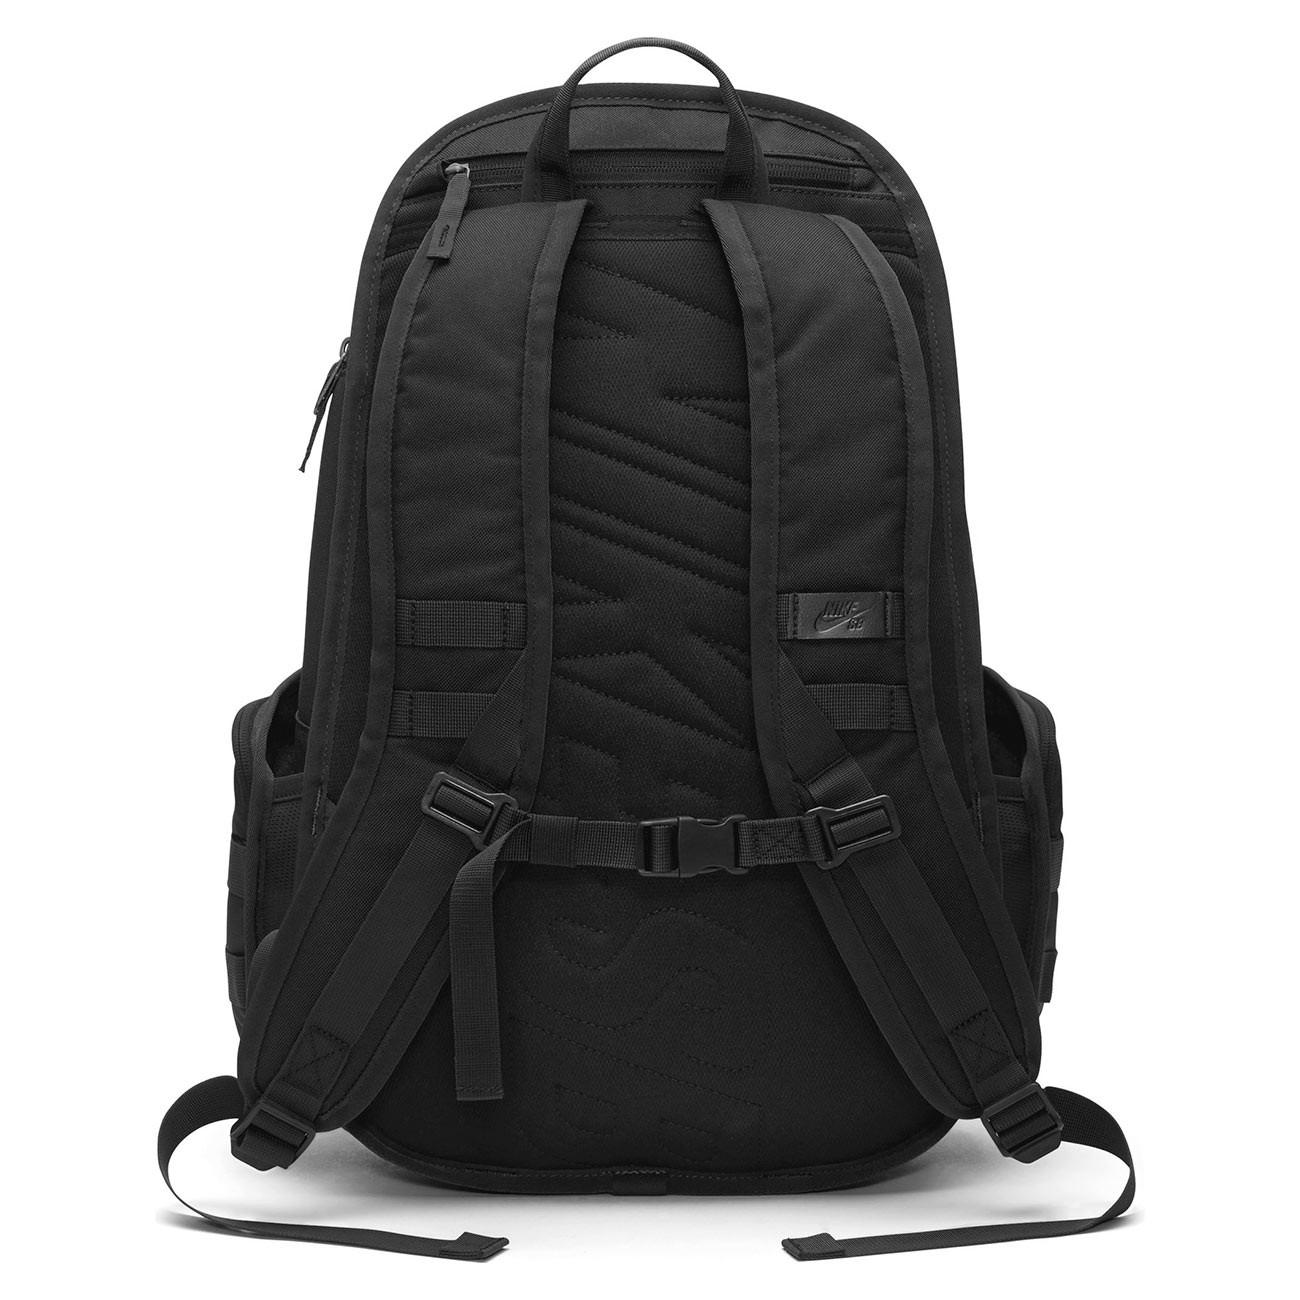 ad84835035 Backpack Nike SB Rpm black black black